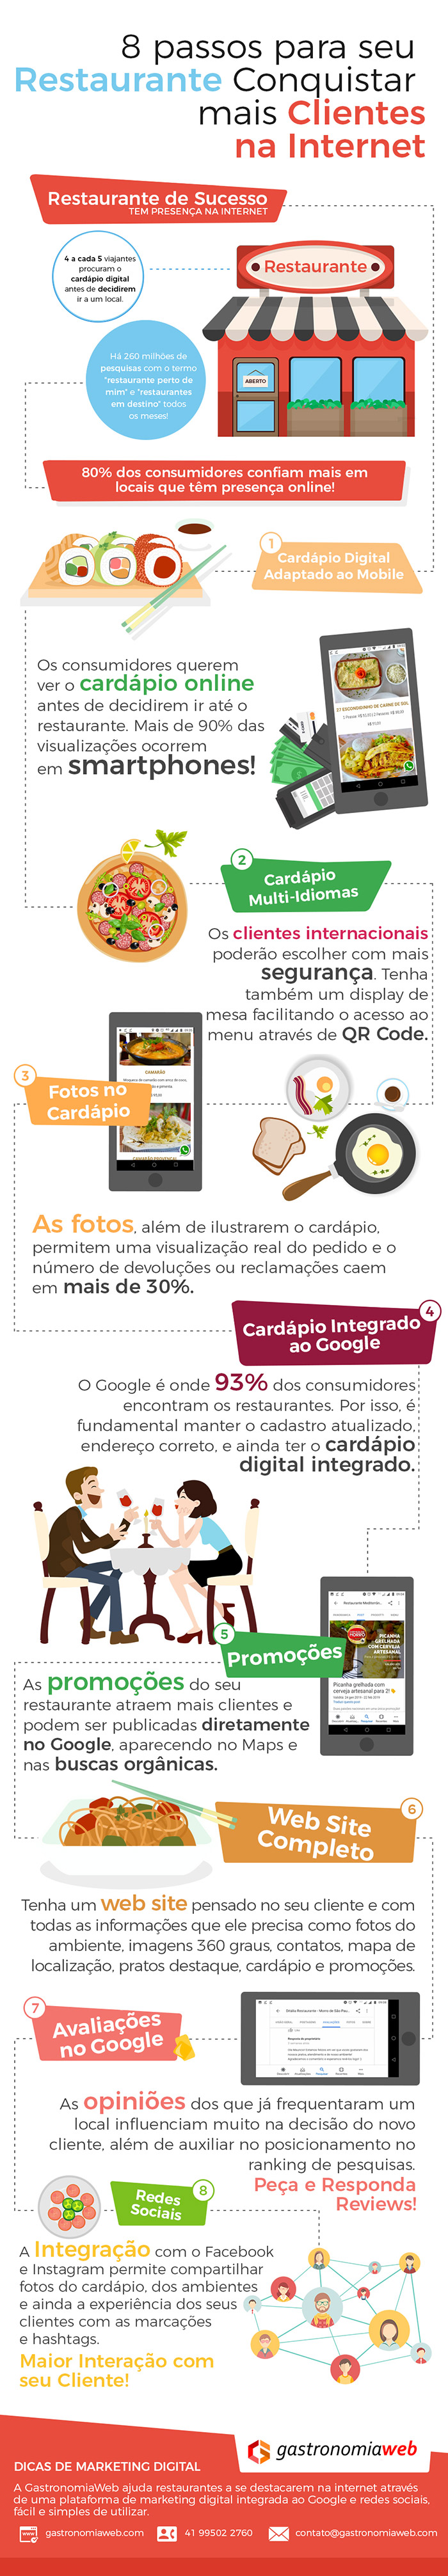 infografico-gastronomiaweb-conqustar